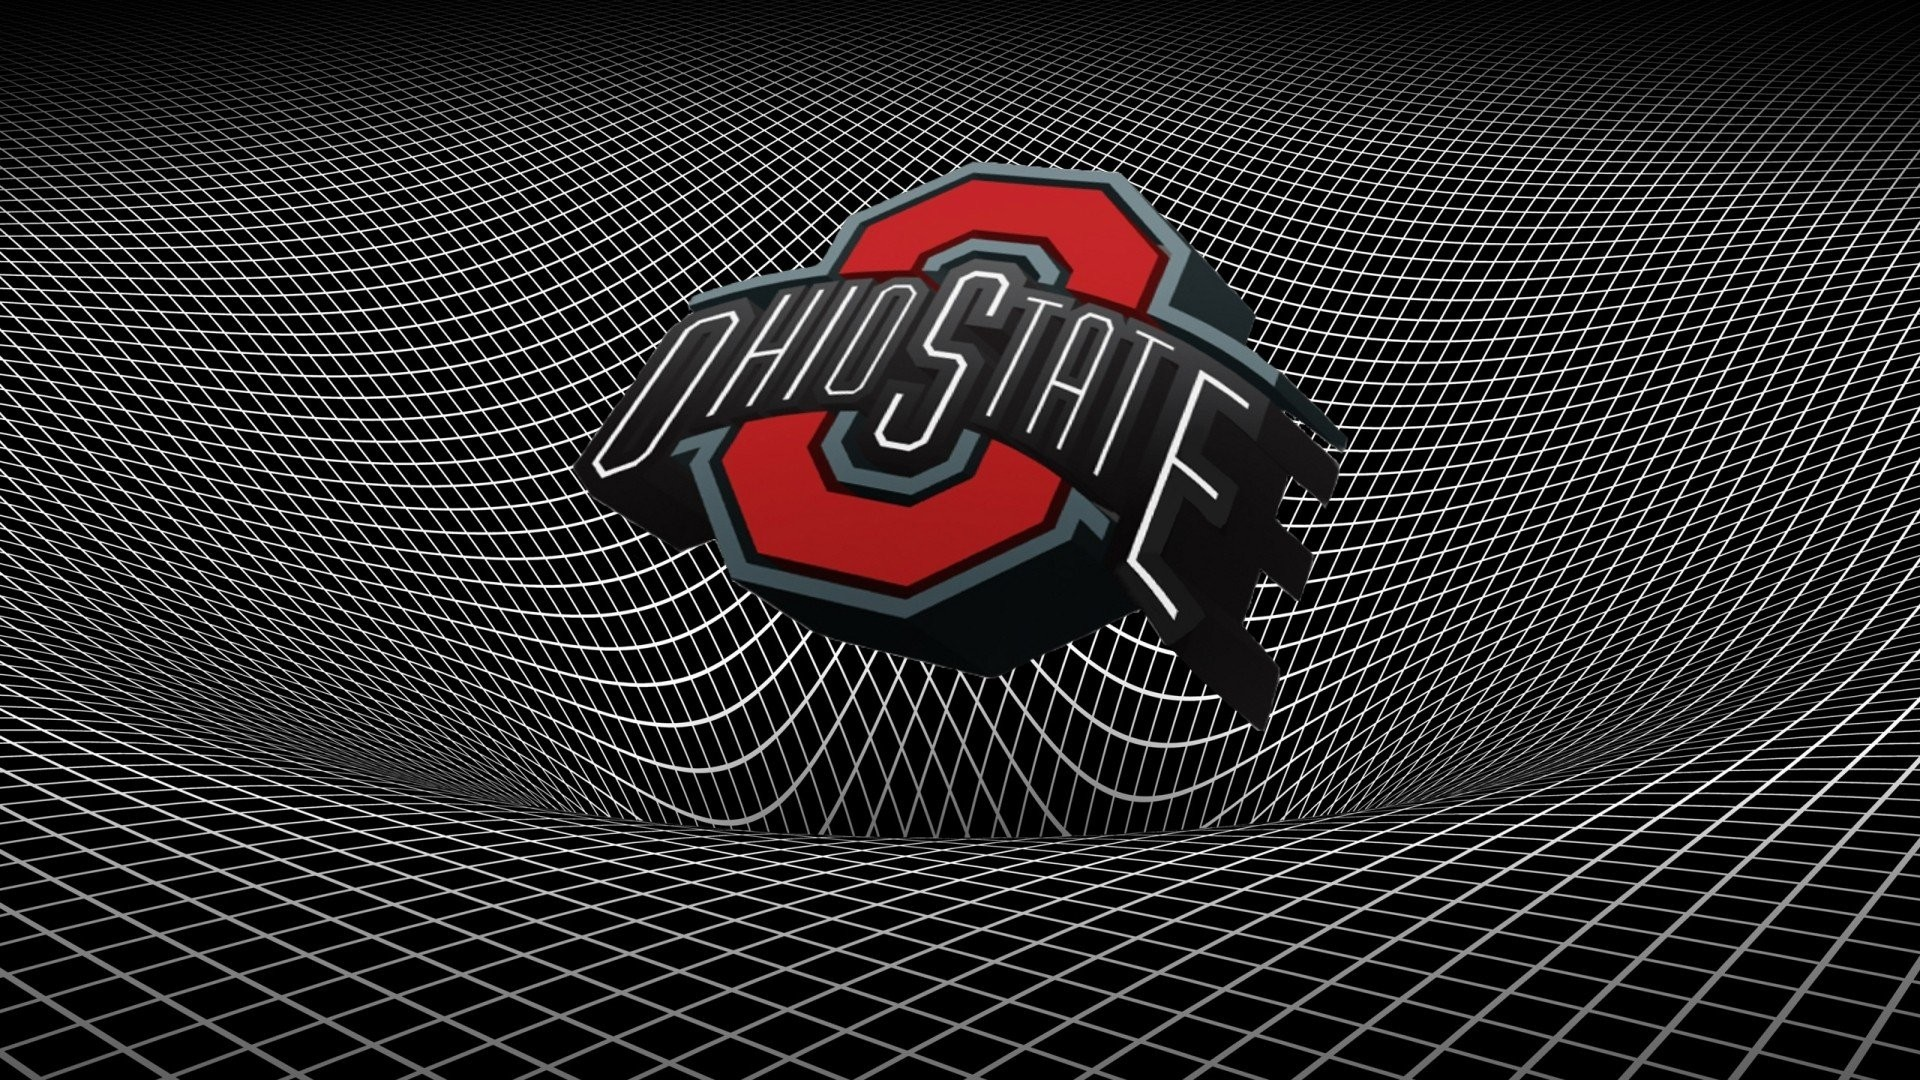 Sports American Football NFL logos Ohio State football teams Football Logos  wallpaper | | 235917 | WallpaperUP